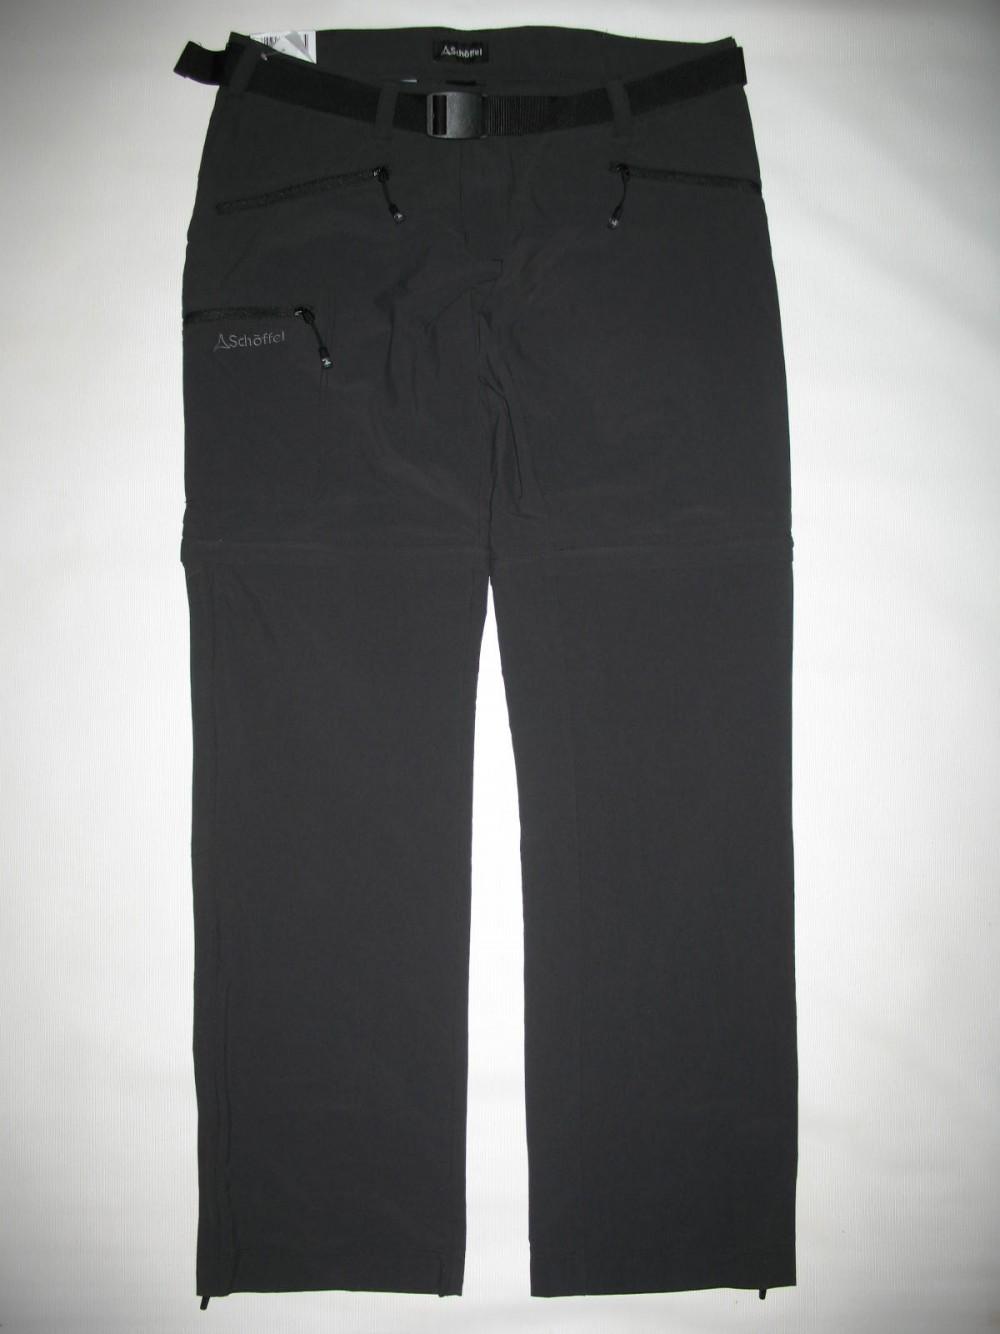 Штаны SCHOFFEL cartagena outdoor pants lady (размер 38-М) - 3